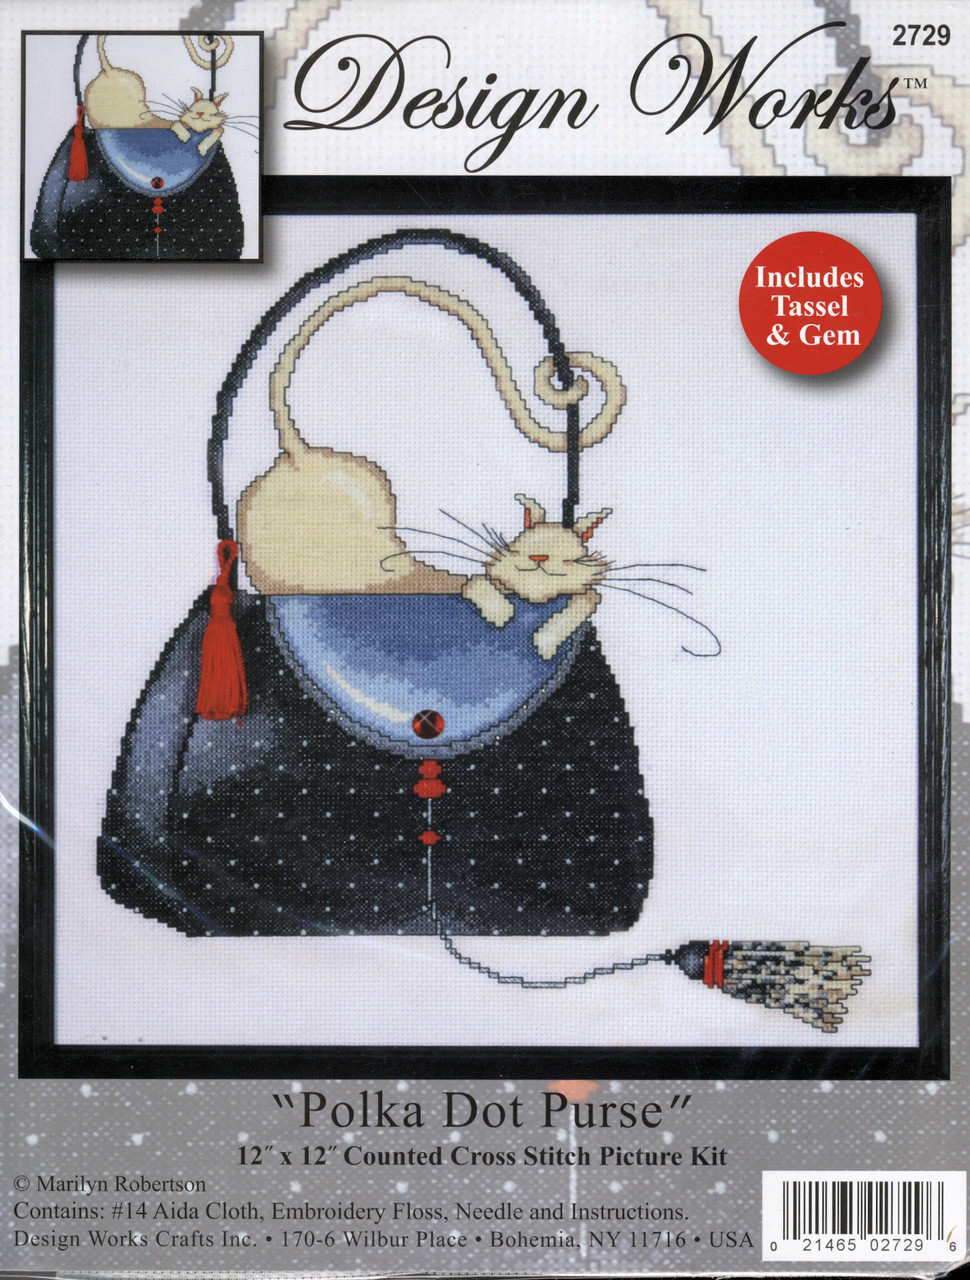 Design Works - Polka Dot Purse